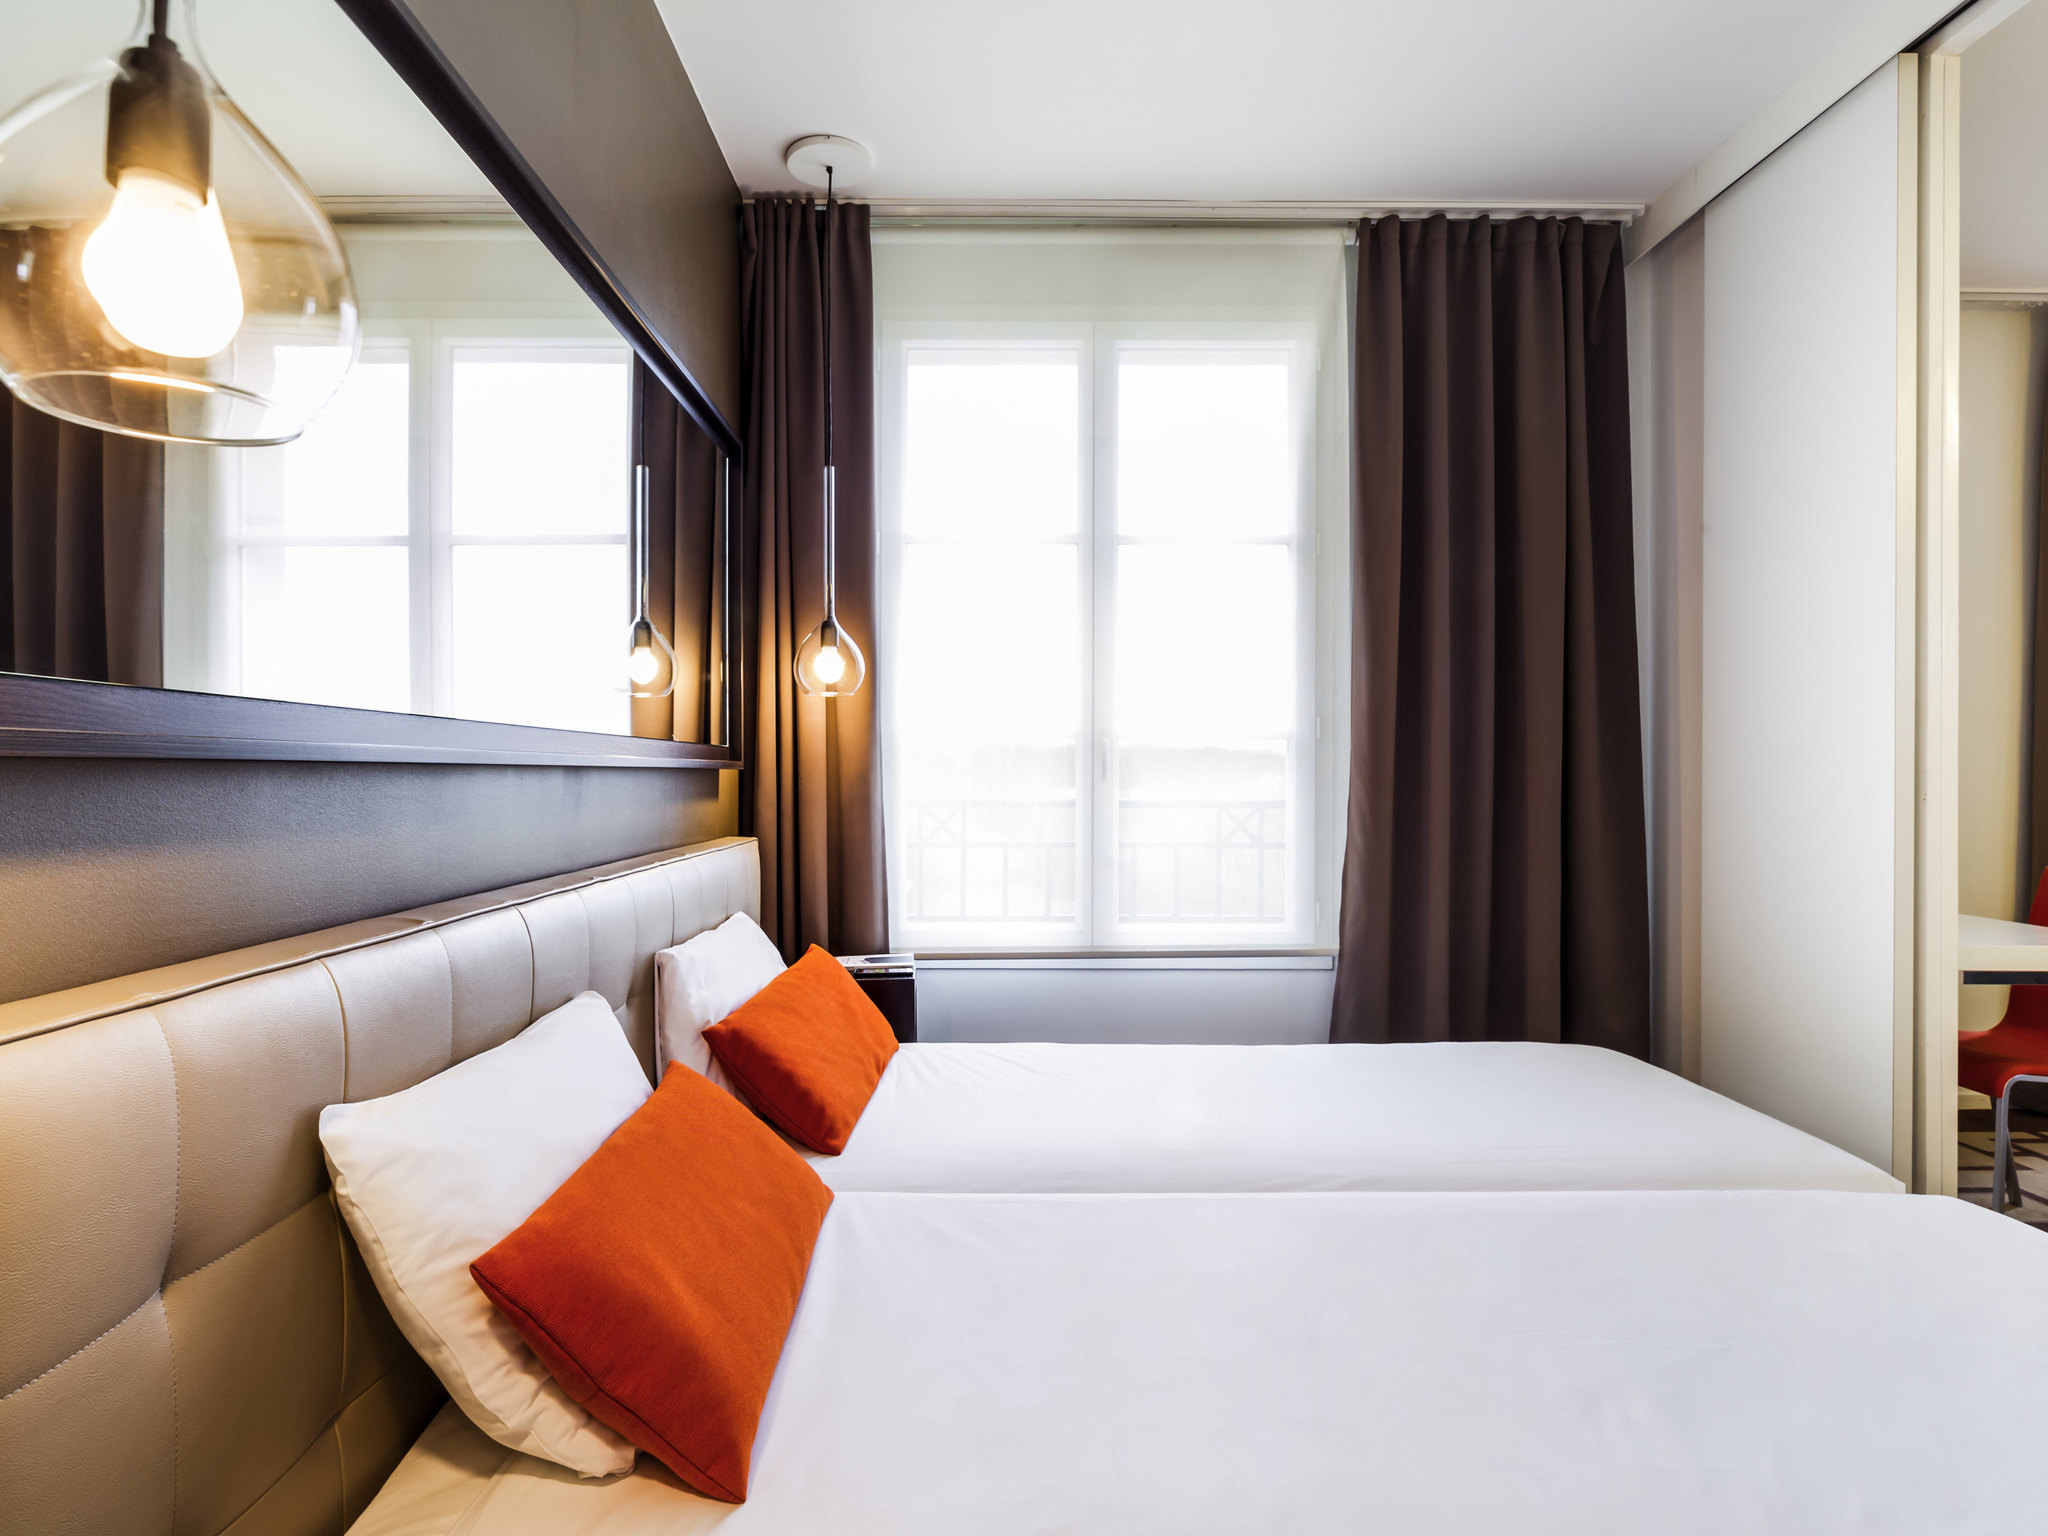 Hotel – Hipark by Adagio Marseille (apertura febbraio 2018)